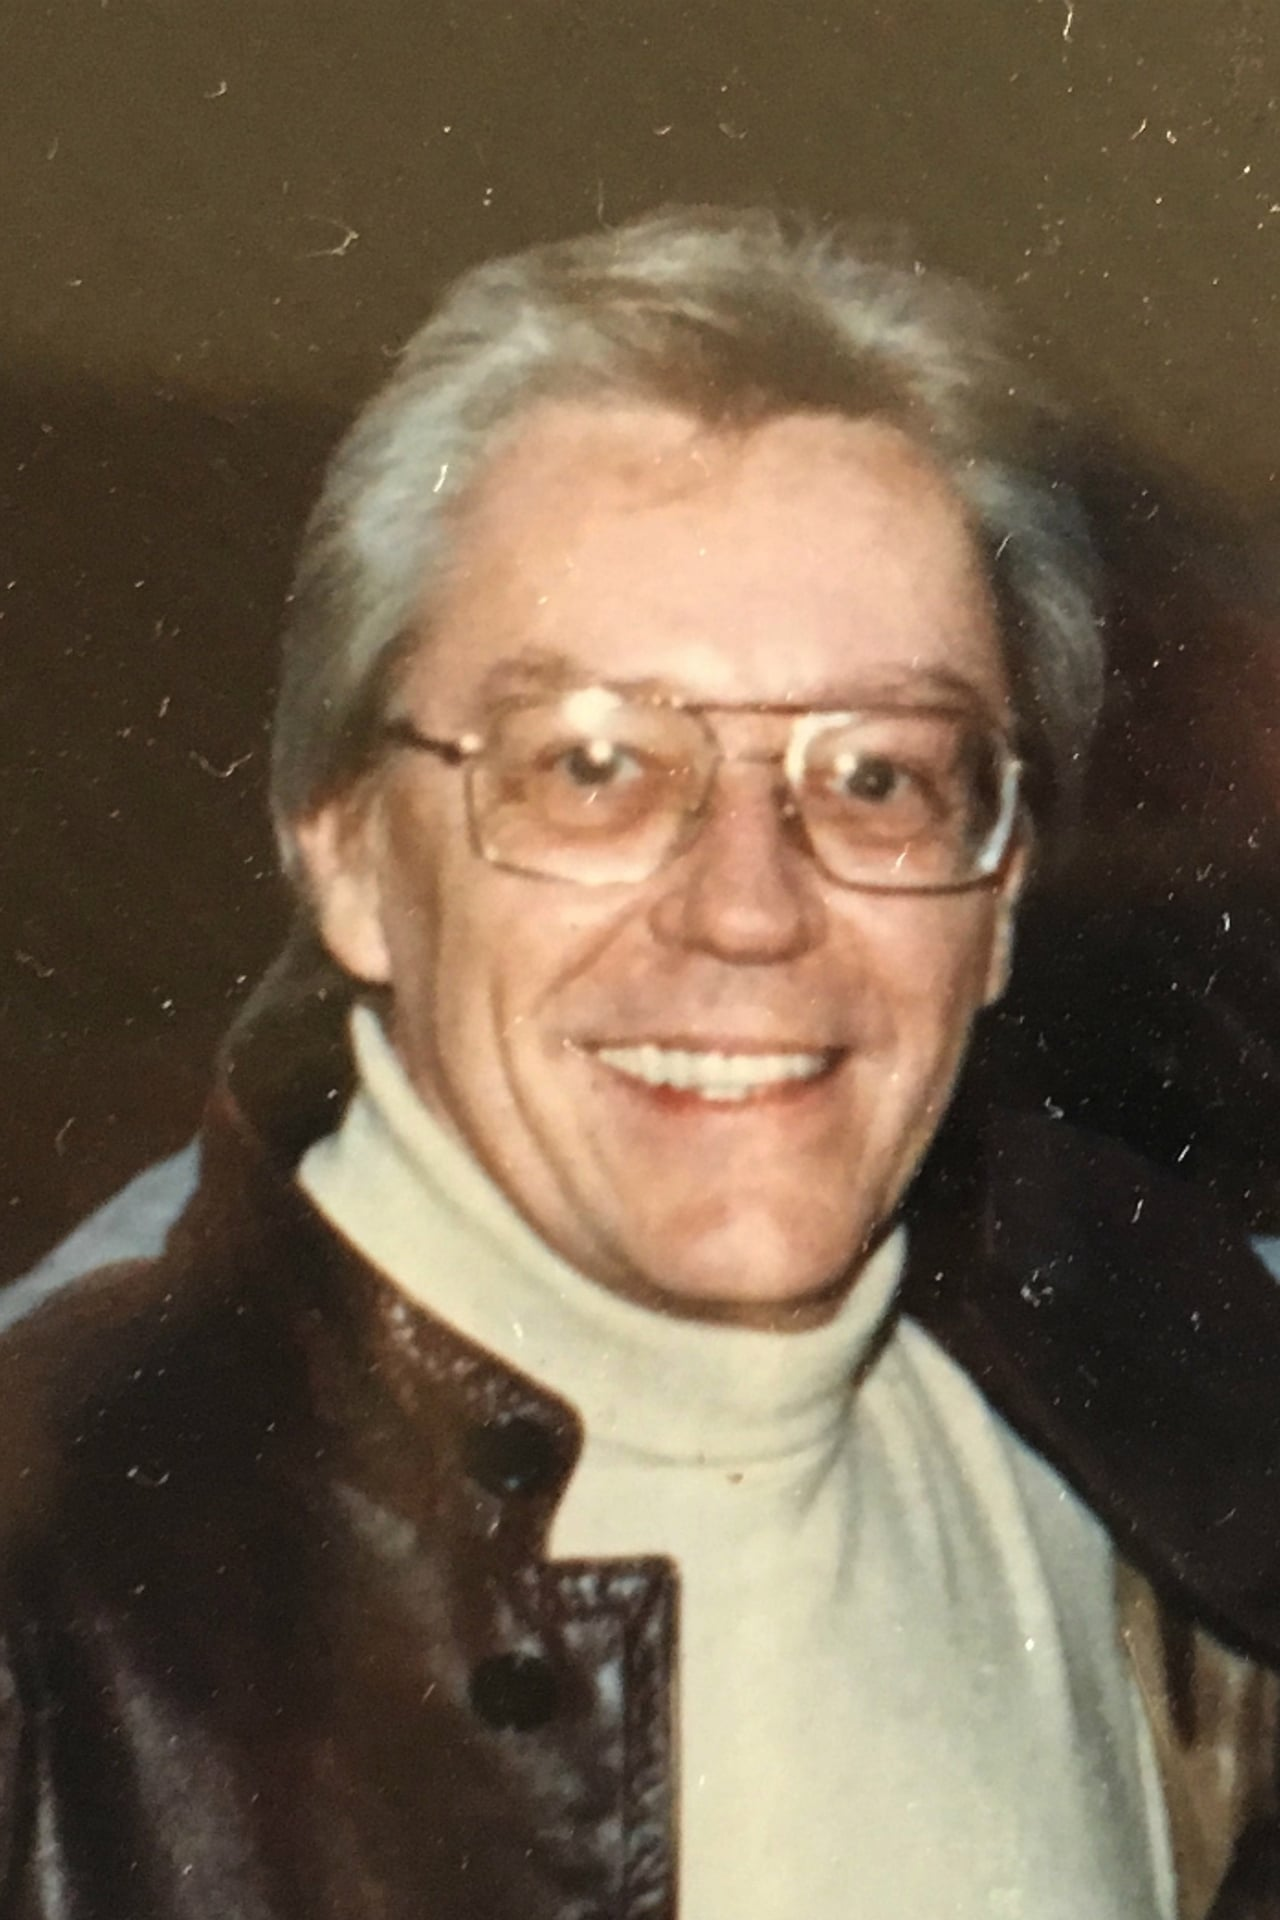 Dennis Shryack